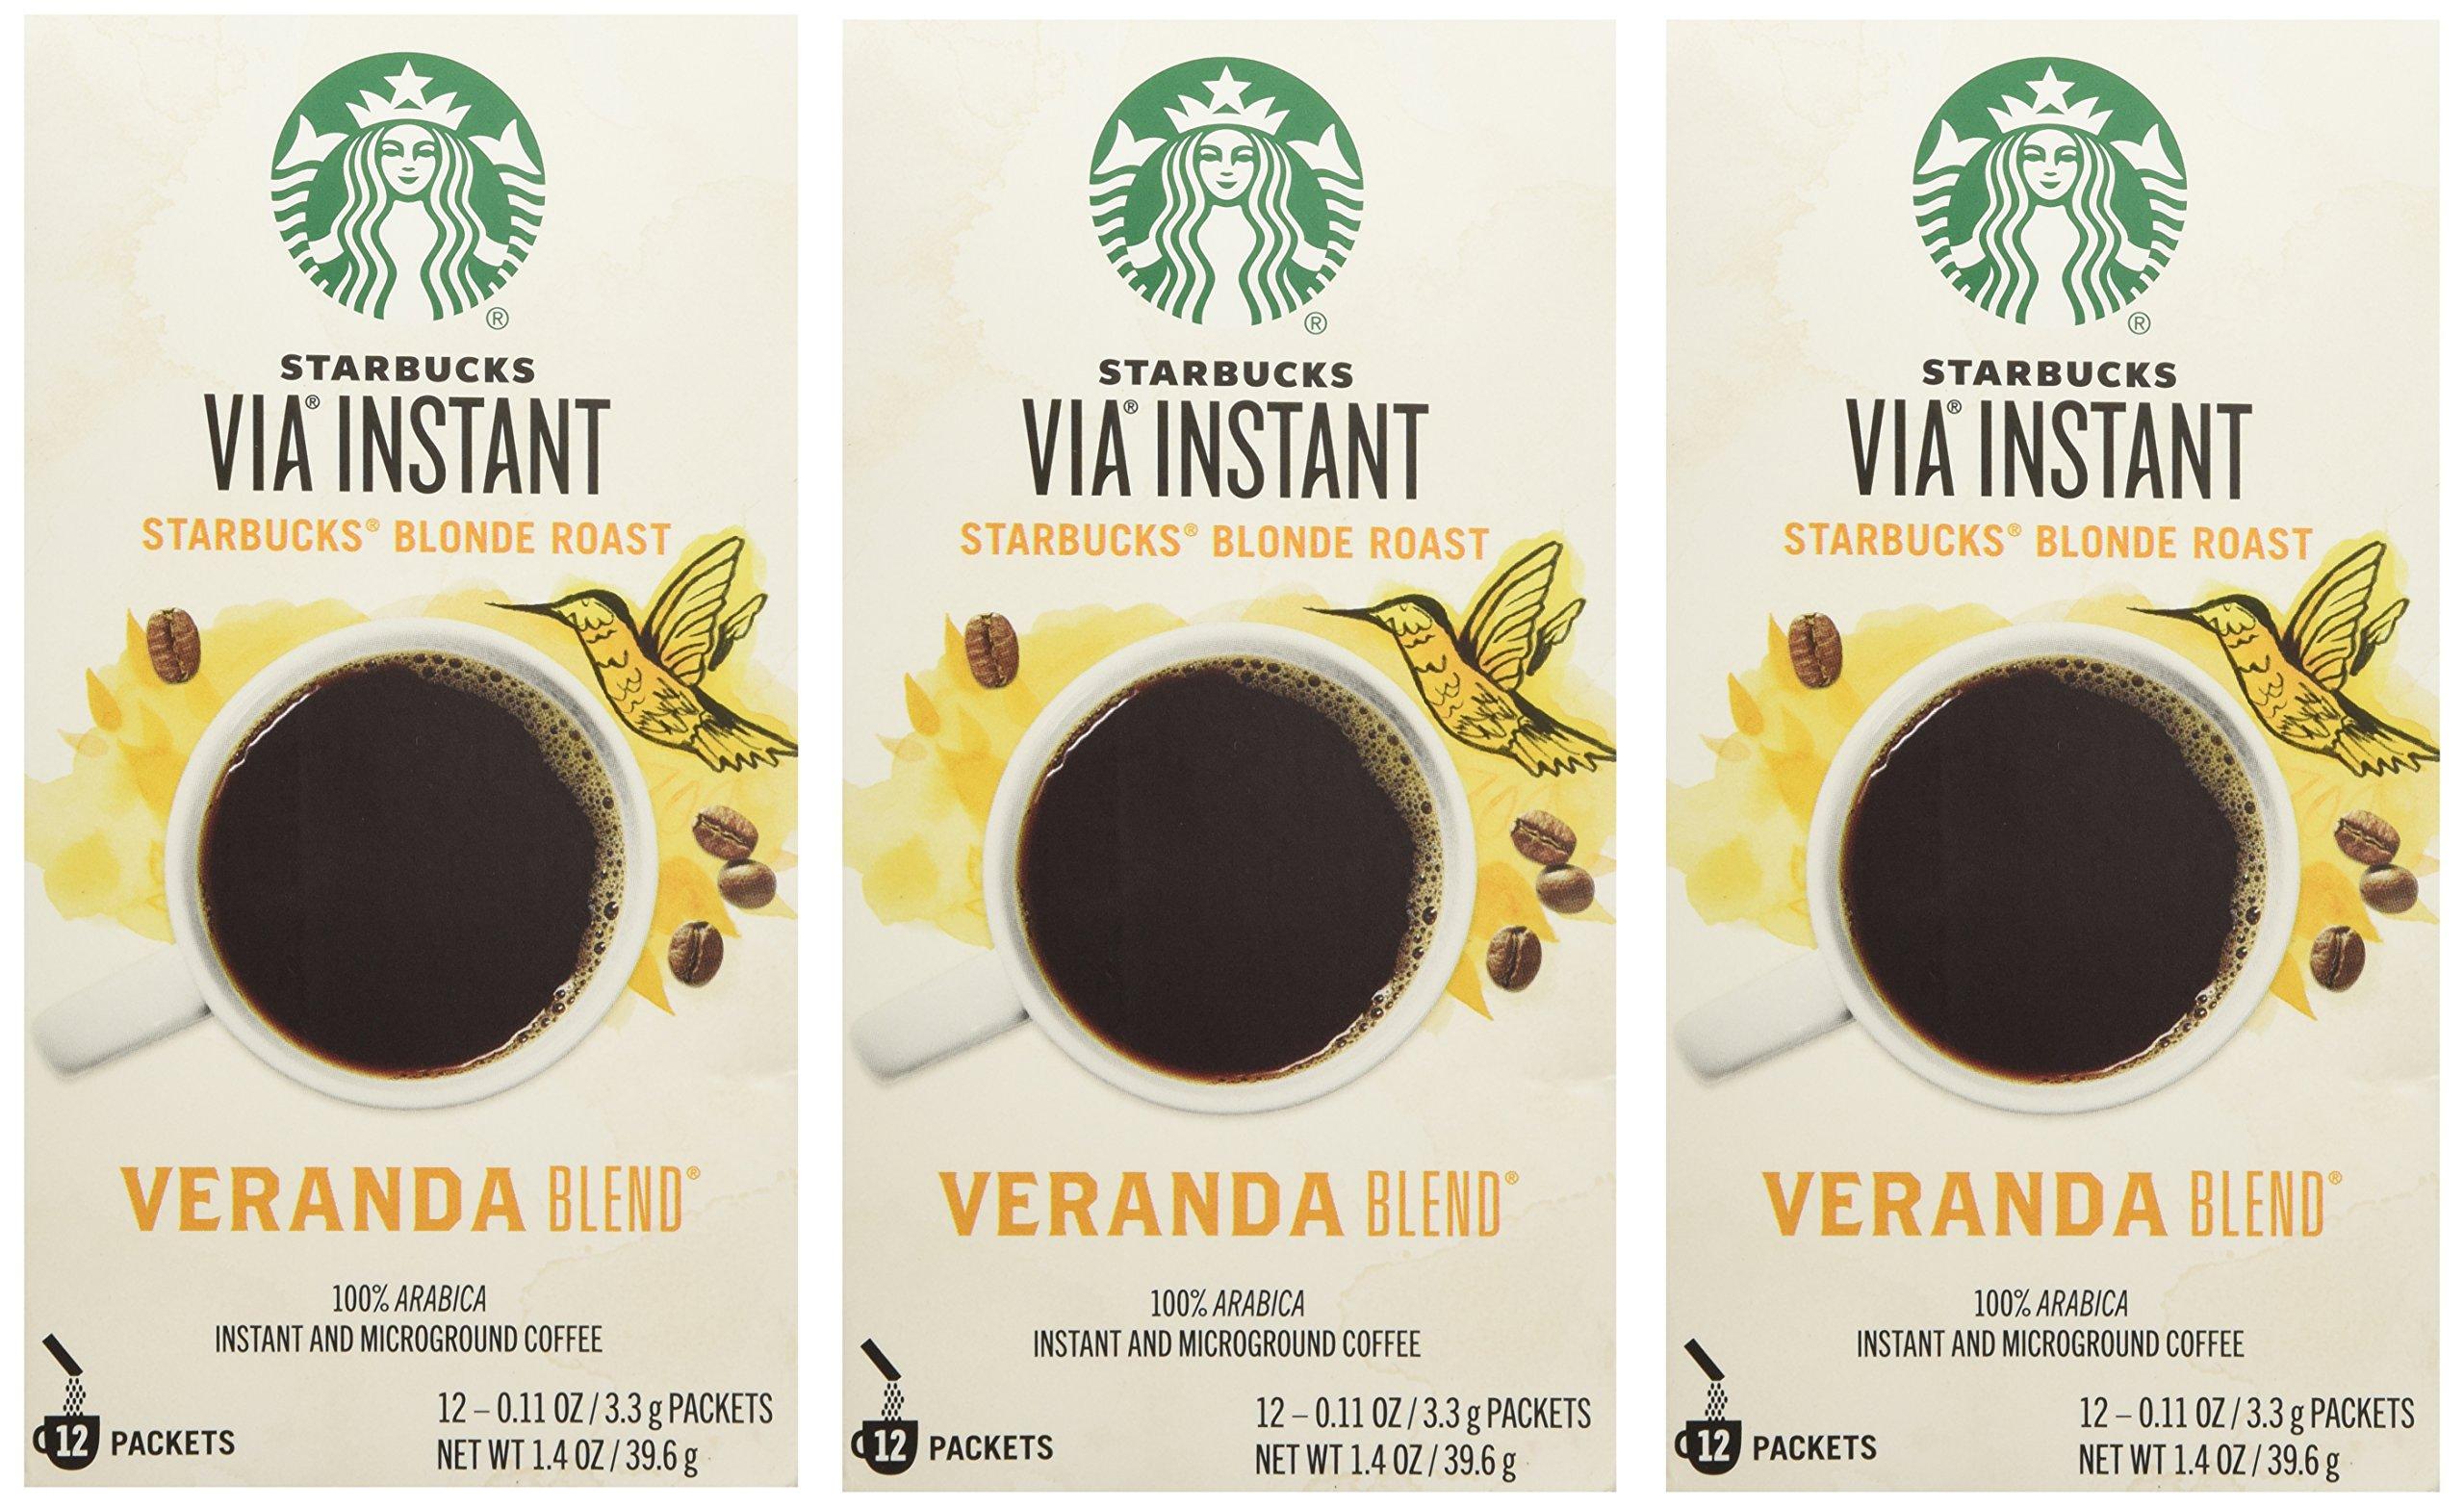 Starbucks VIA® Ready Brew Coffee Veranda Blend Blonde Roast (3 Pack/Boxes) 36 Packets Total